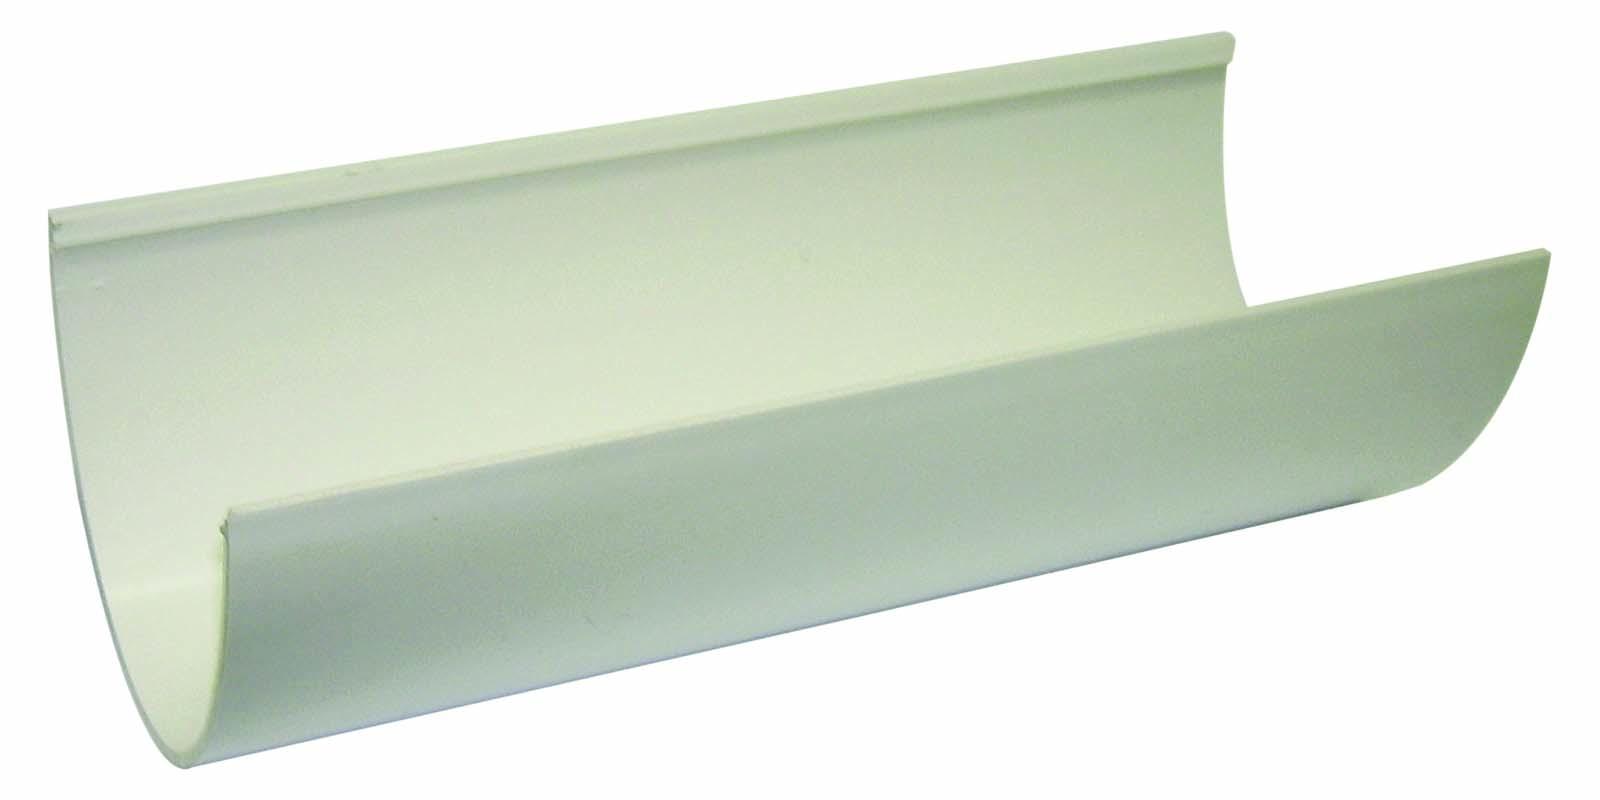 FLOPLAST HI-CAP GUTTER - RGH4 GUTTER - WHITE